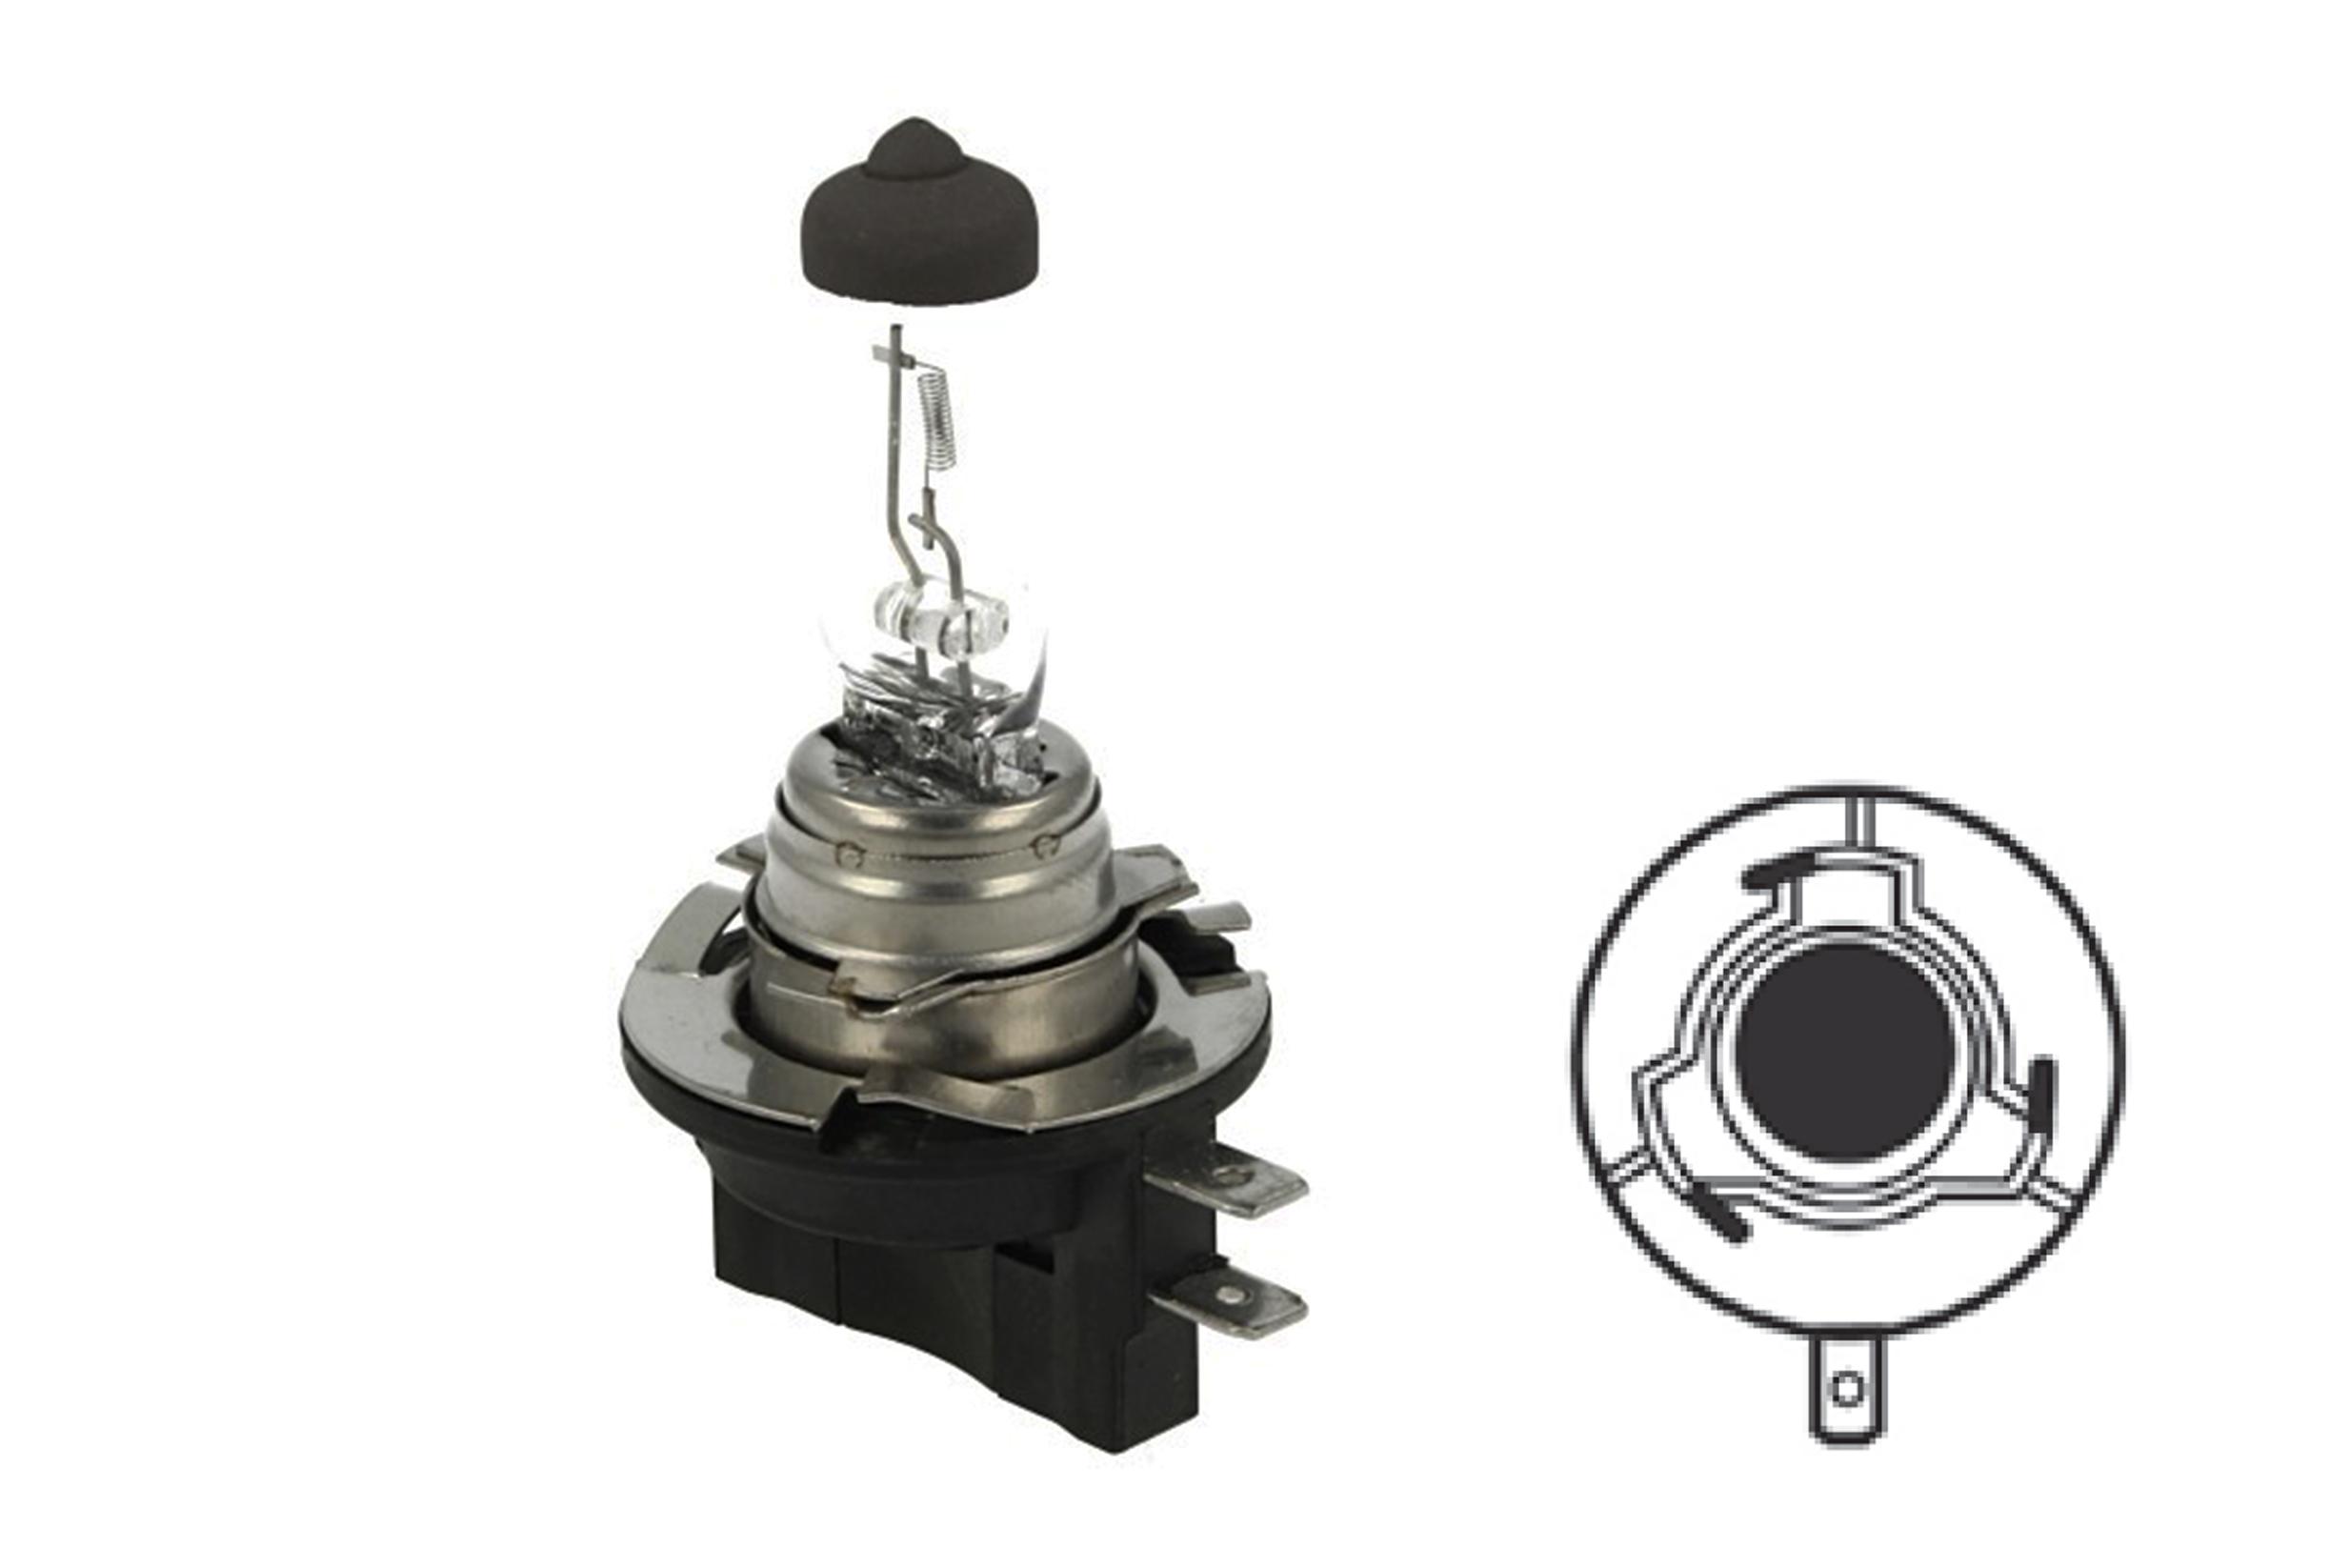 Lampada Alogena H11B 12V 55W PGJY19-2 Clear Compatibile Osram OA6424 - PZ